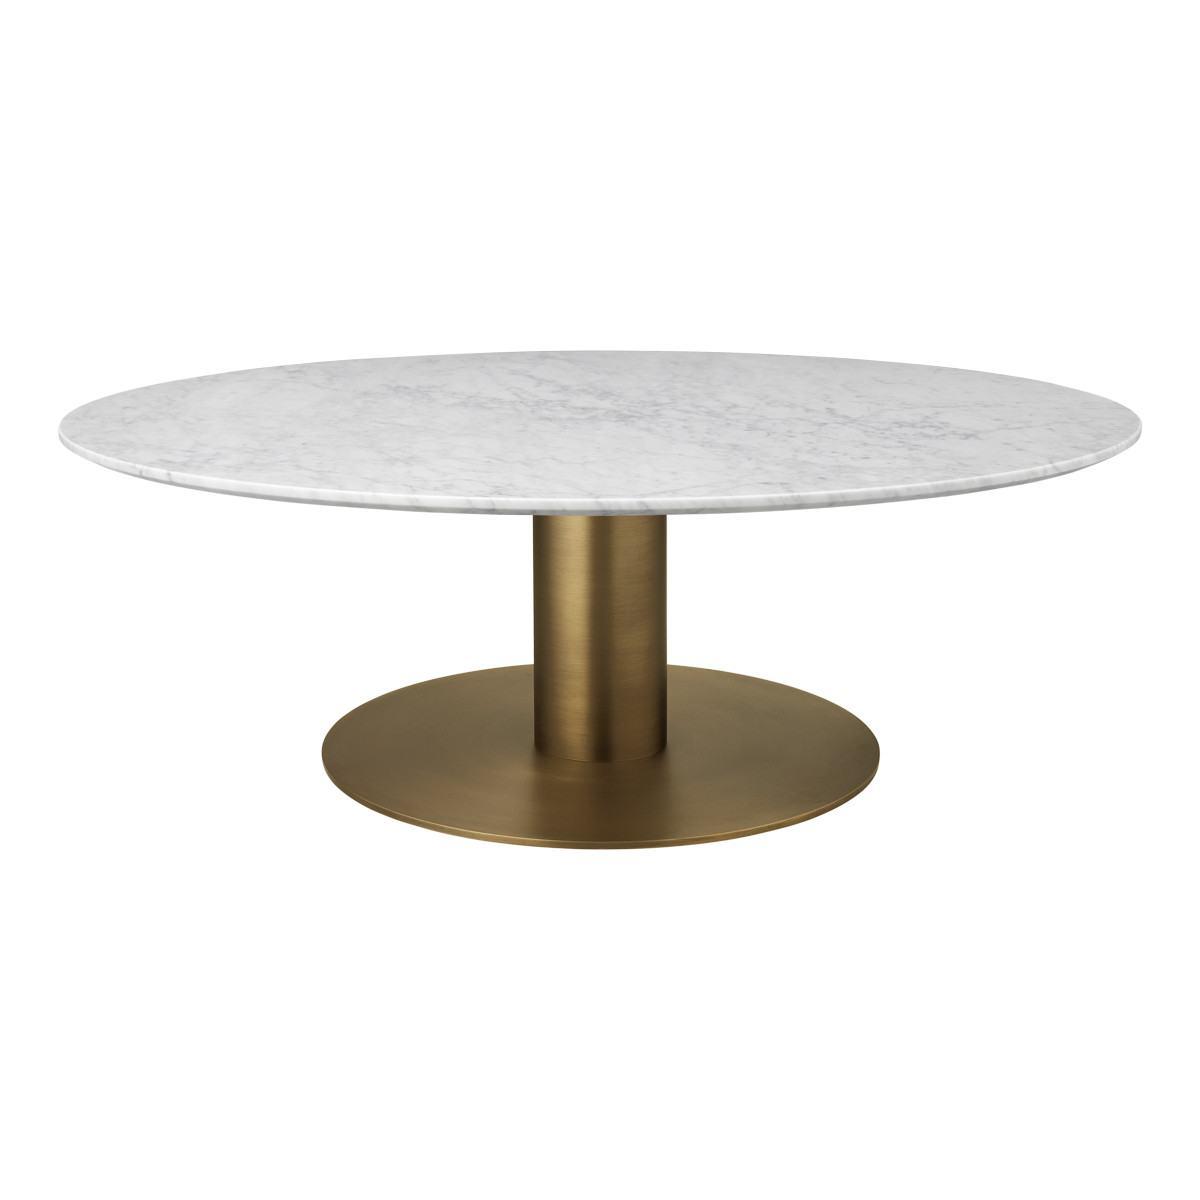 Gubi 2 0 Coffee Table Round 130cm Diameter Beut Co Uk